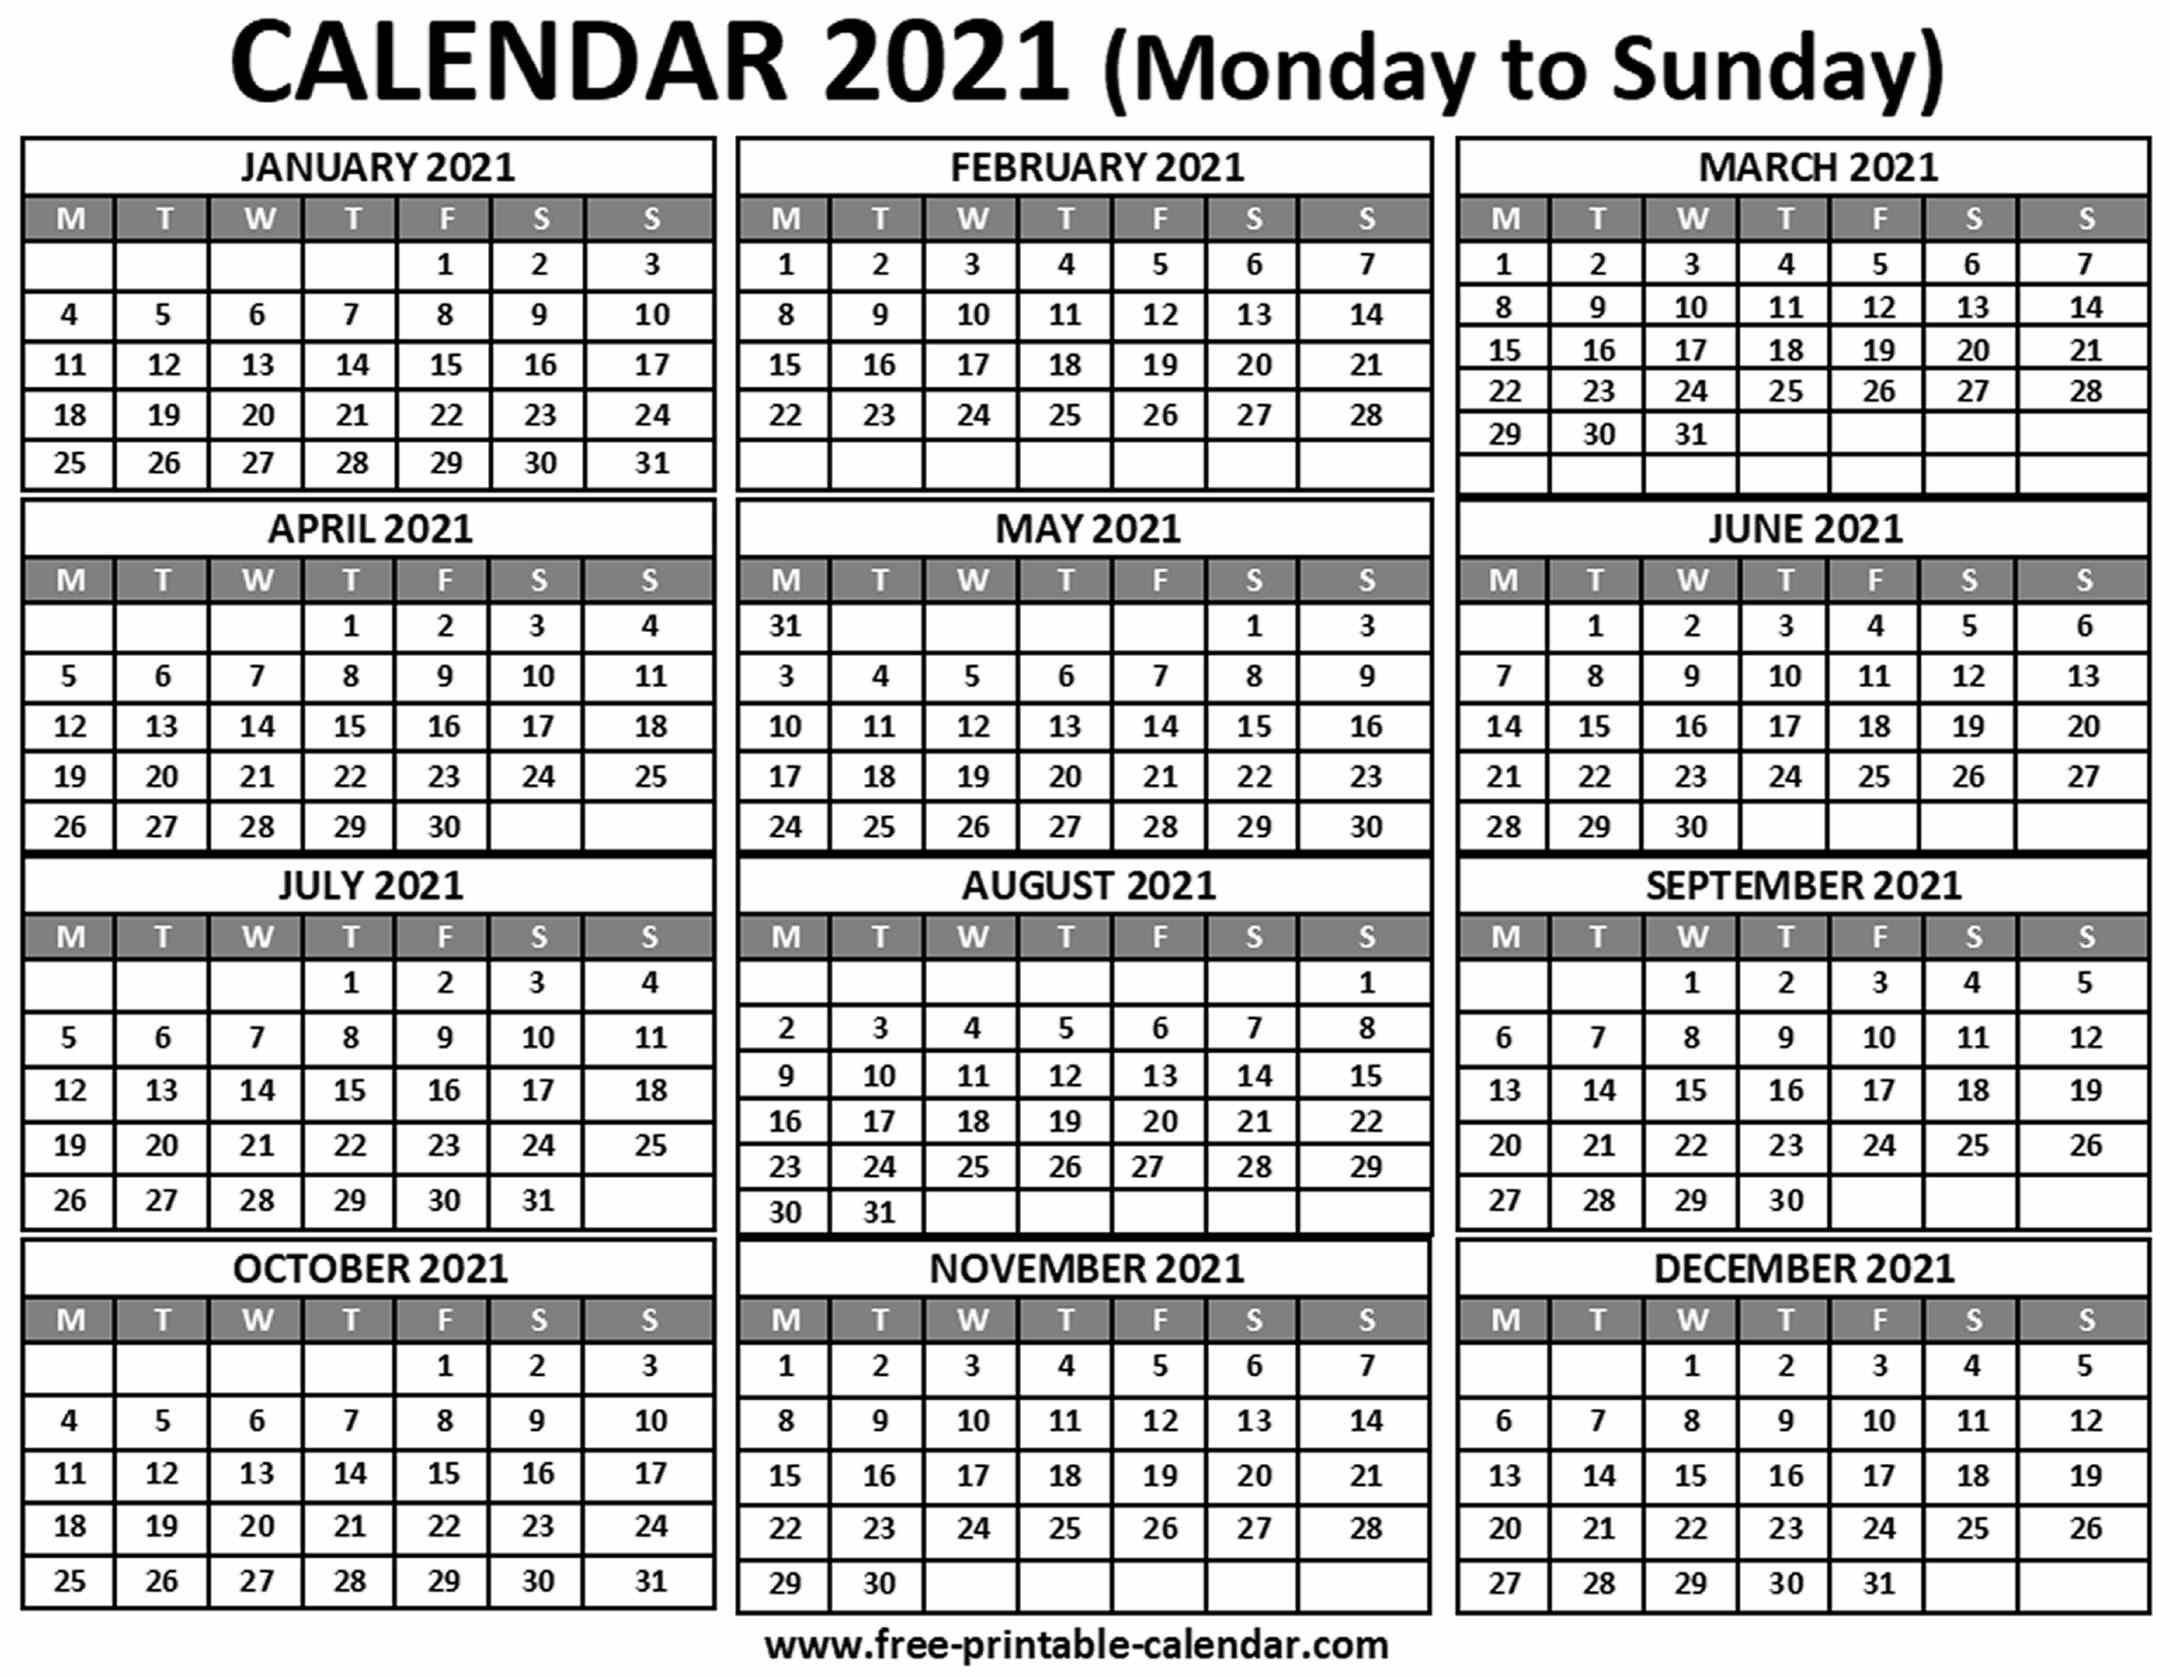 2021 Calendar Free printable calendar